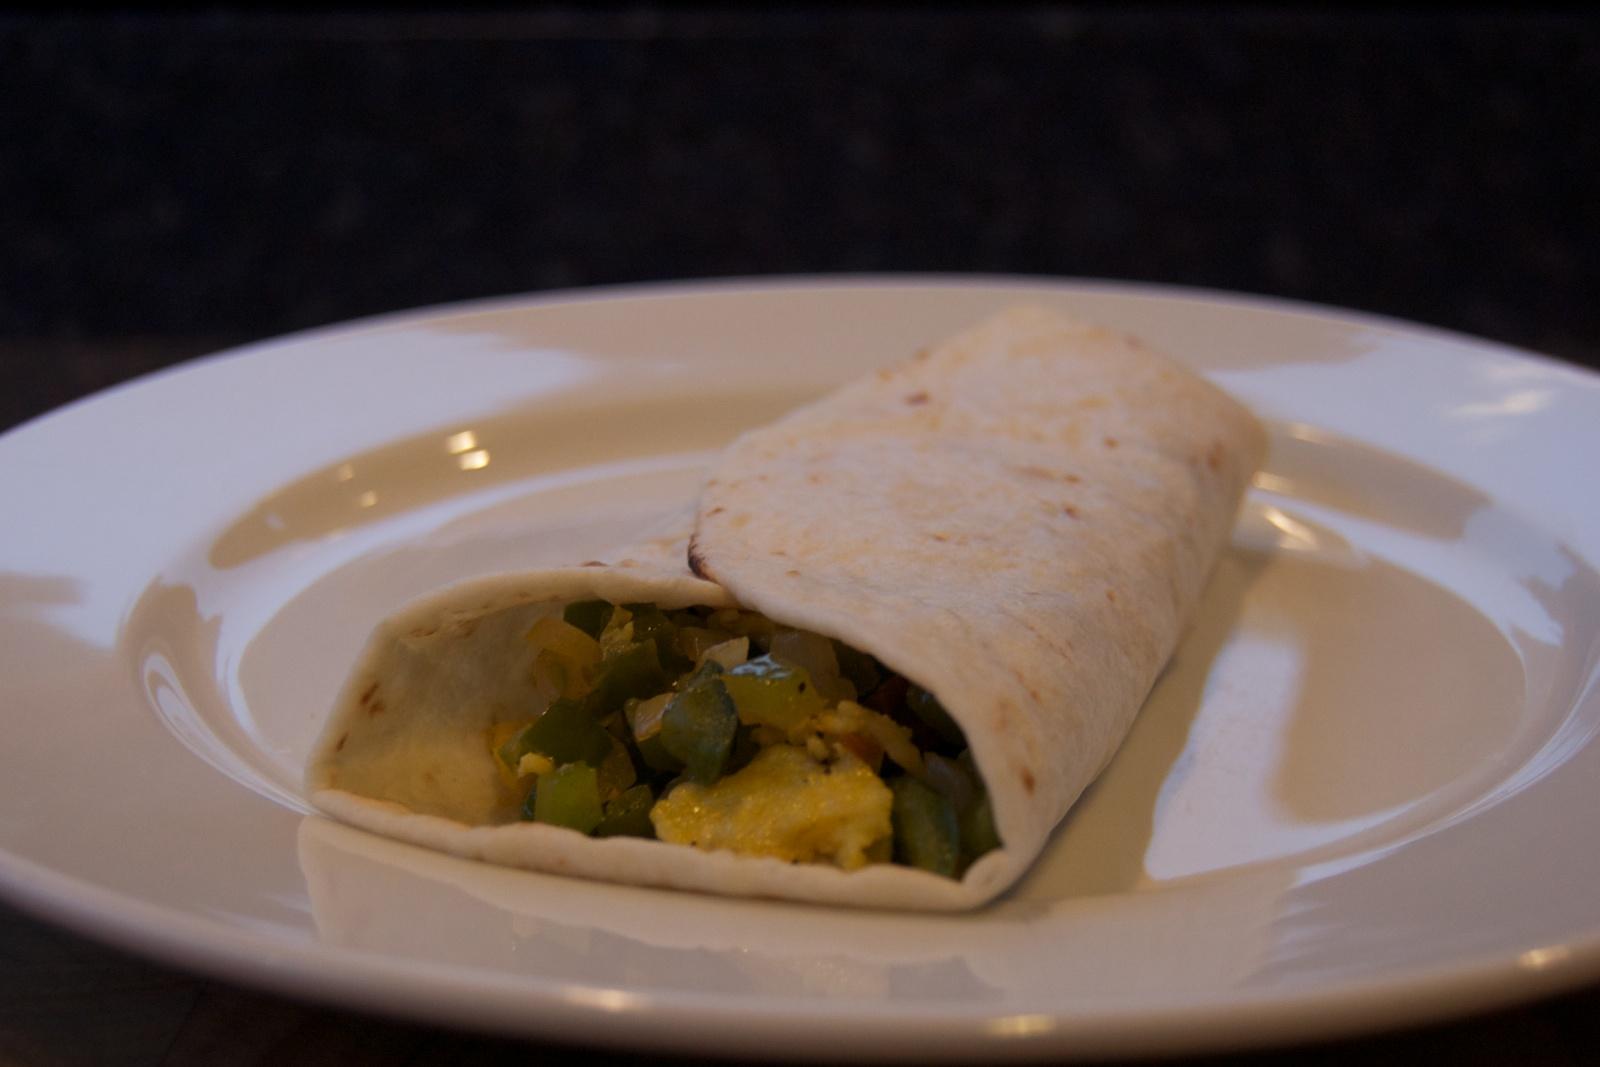 http://blog.rickk.com/food/2013/07/31/ate.2013.07.31.b.jpg